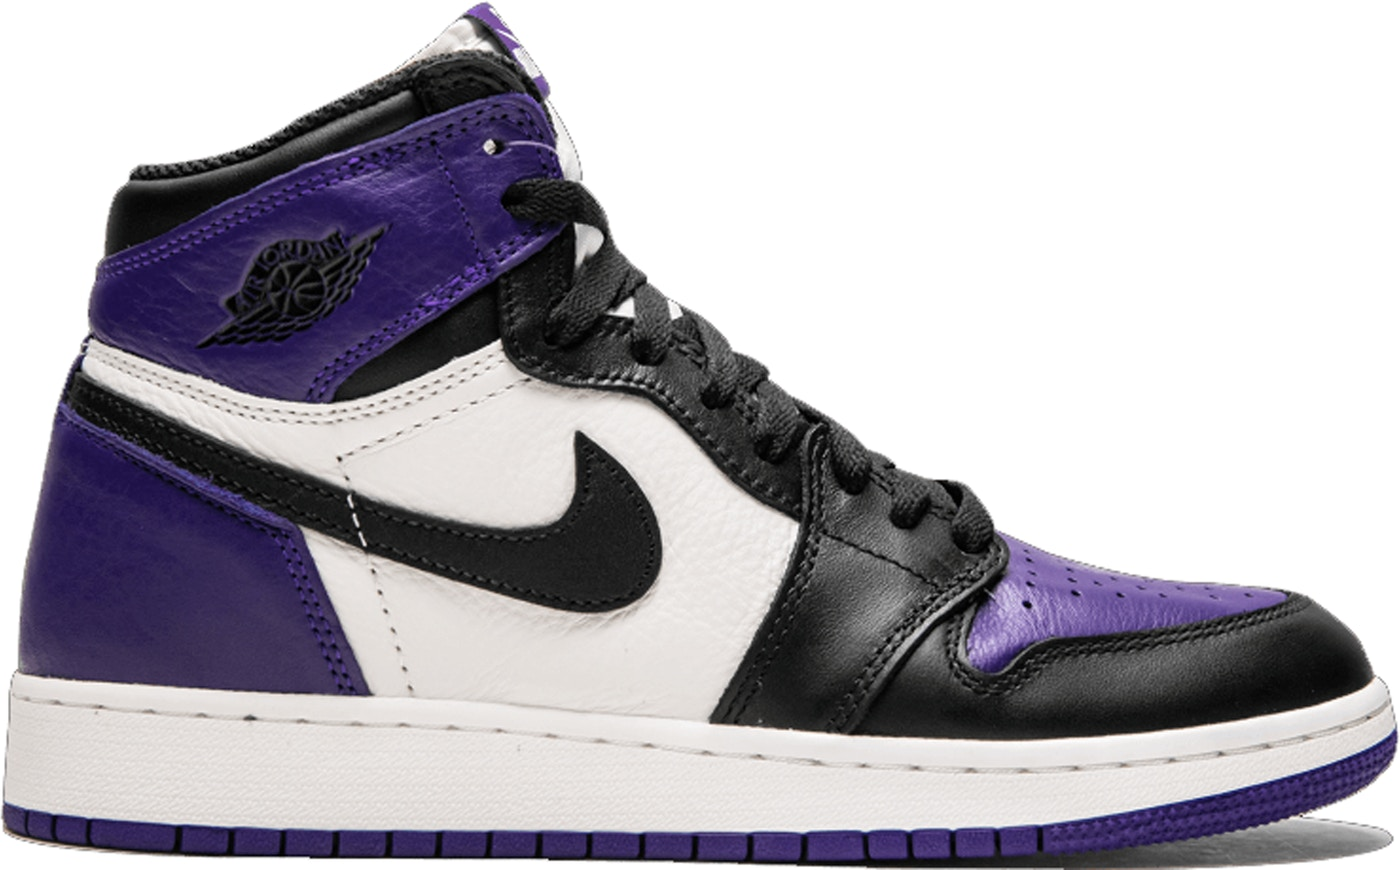 Jordan 1 Retro High Court Purple (GS)